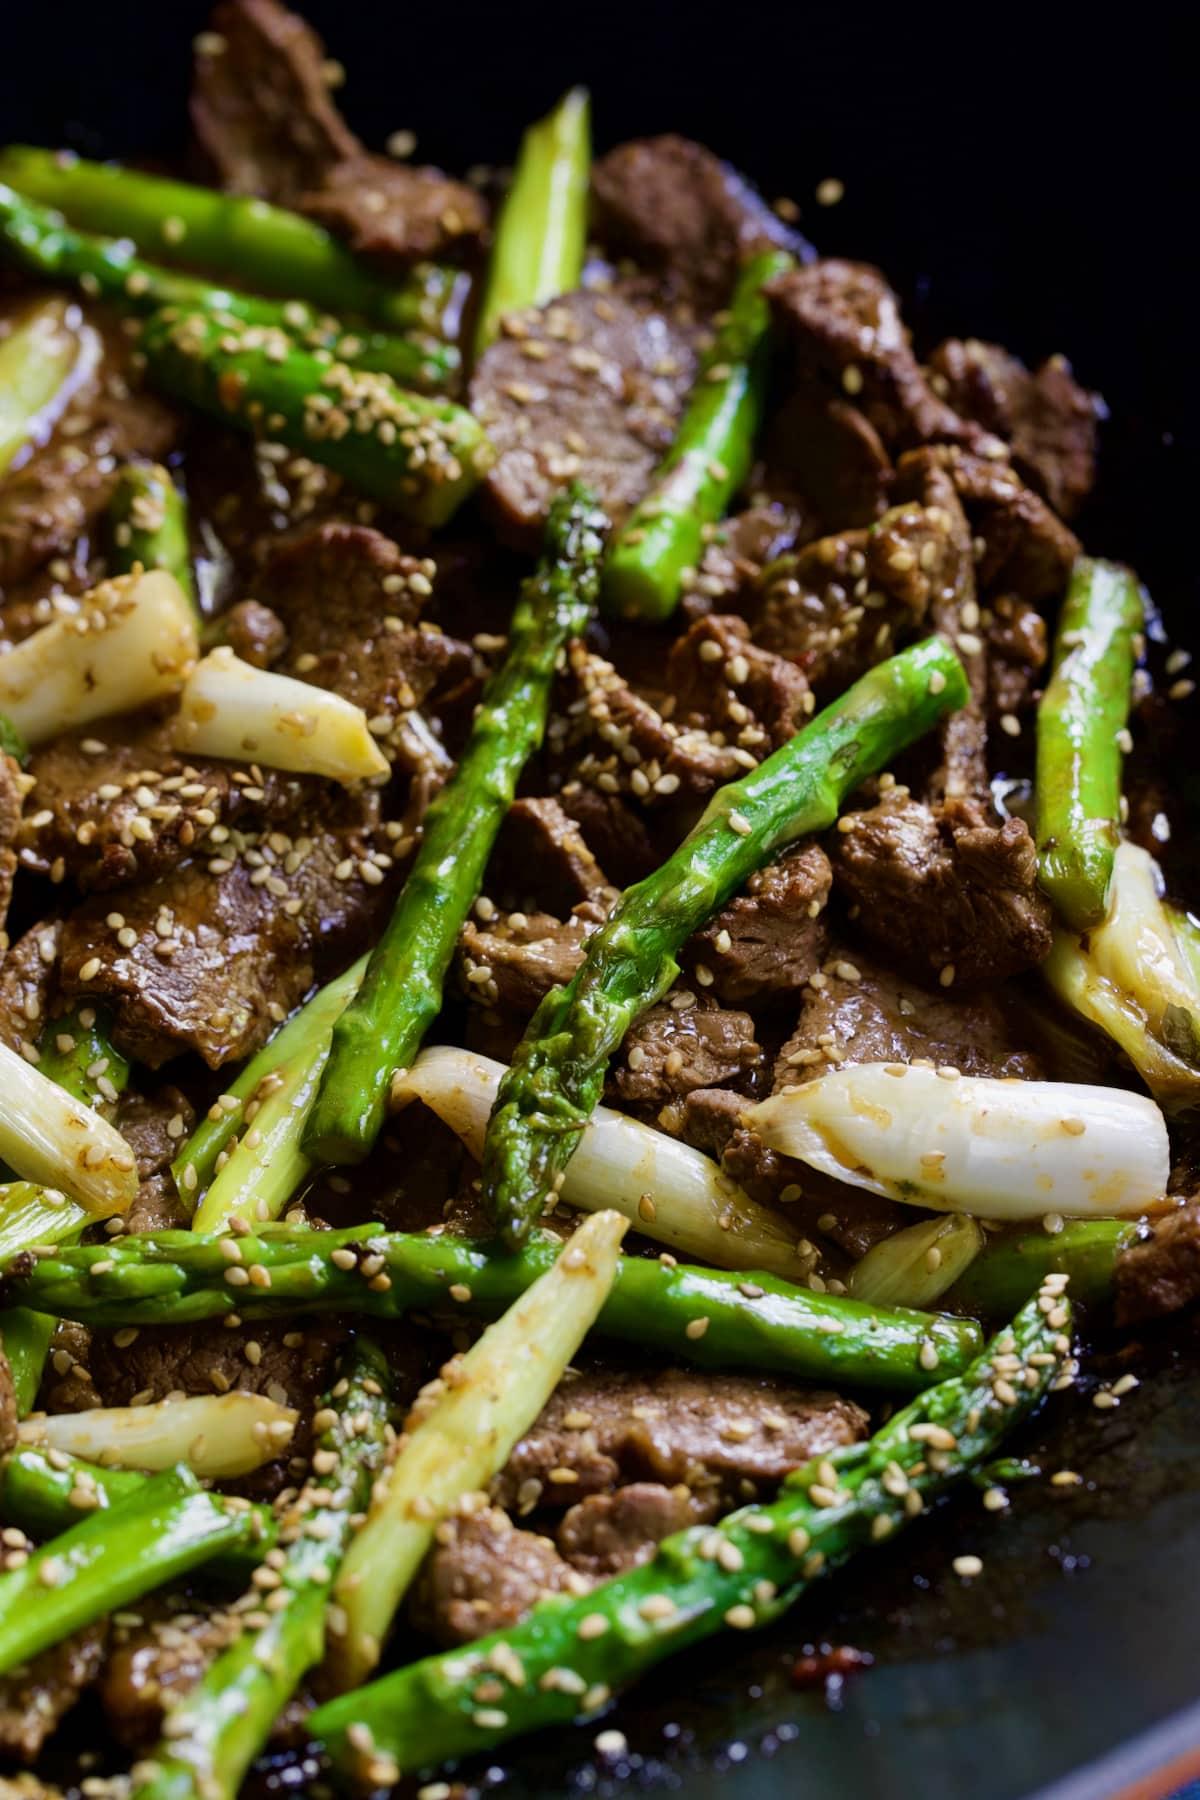 Close-up photo of Sesame Beef and Asparagus Stir-Fry.